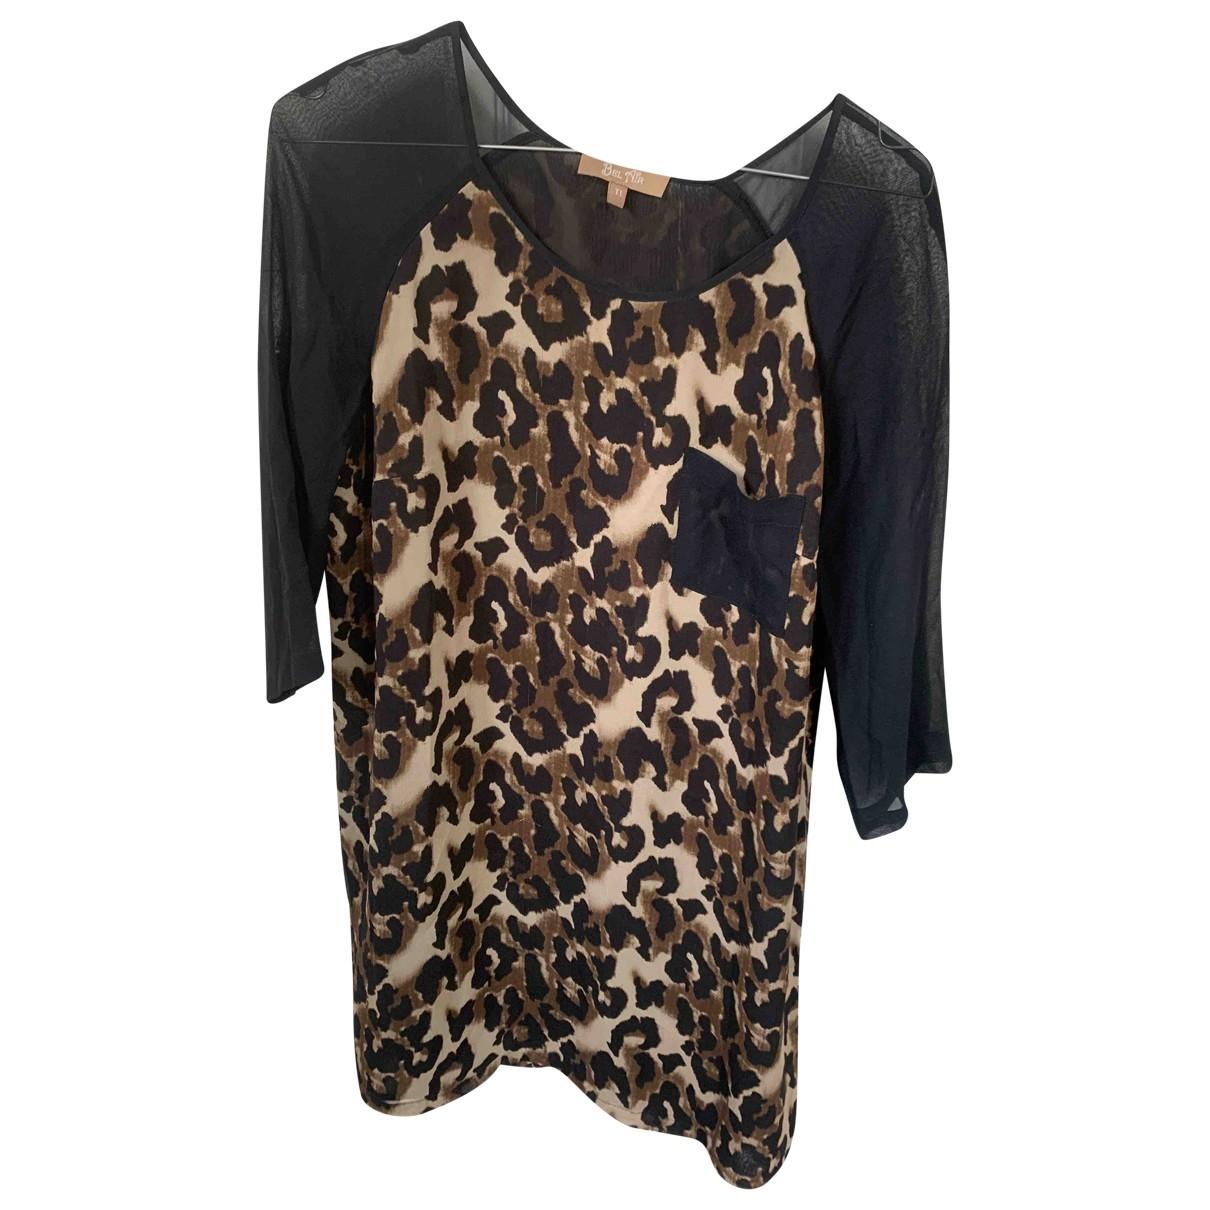 Bel Air \N Silk dress for Women 1 0-5